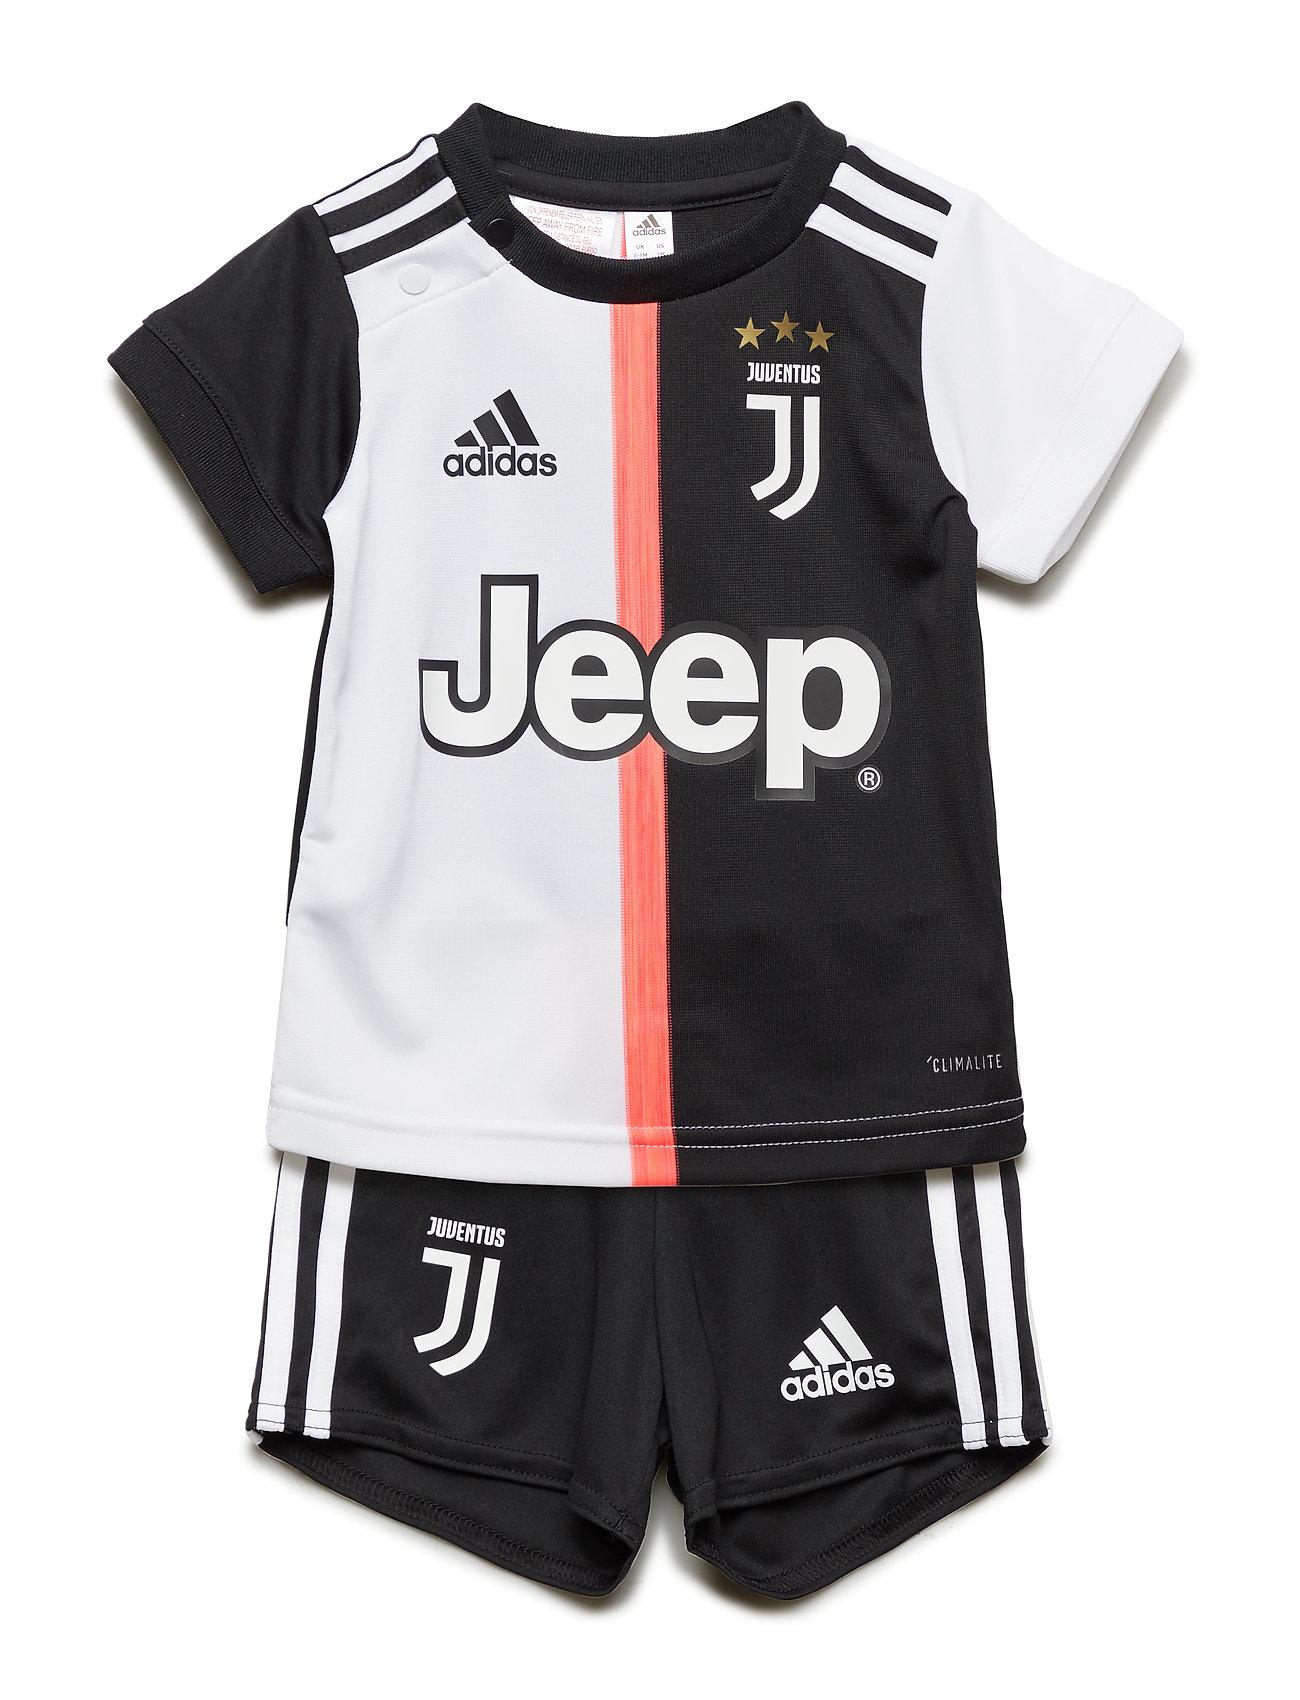 adidas Performance JUVE H BABY - BLACK/WHITE